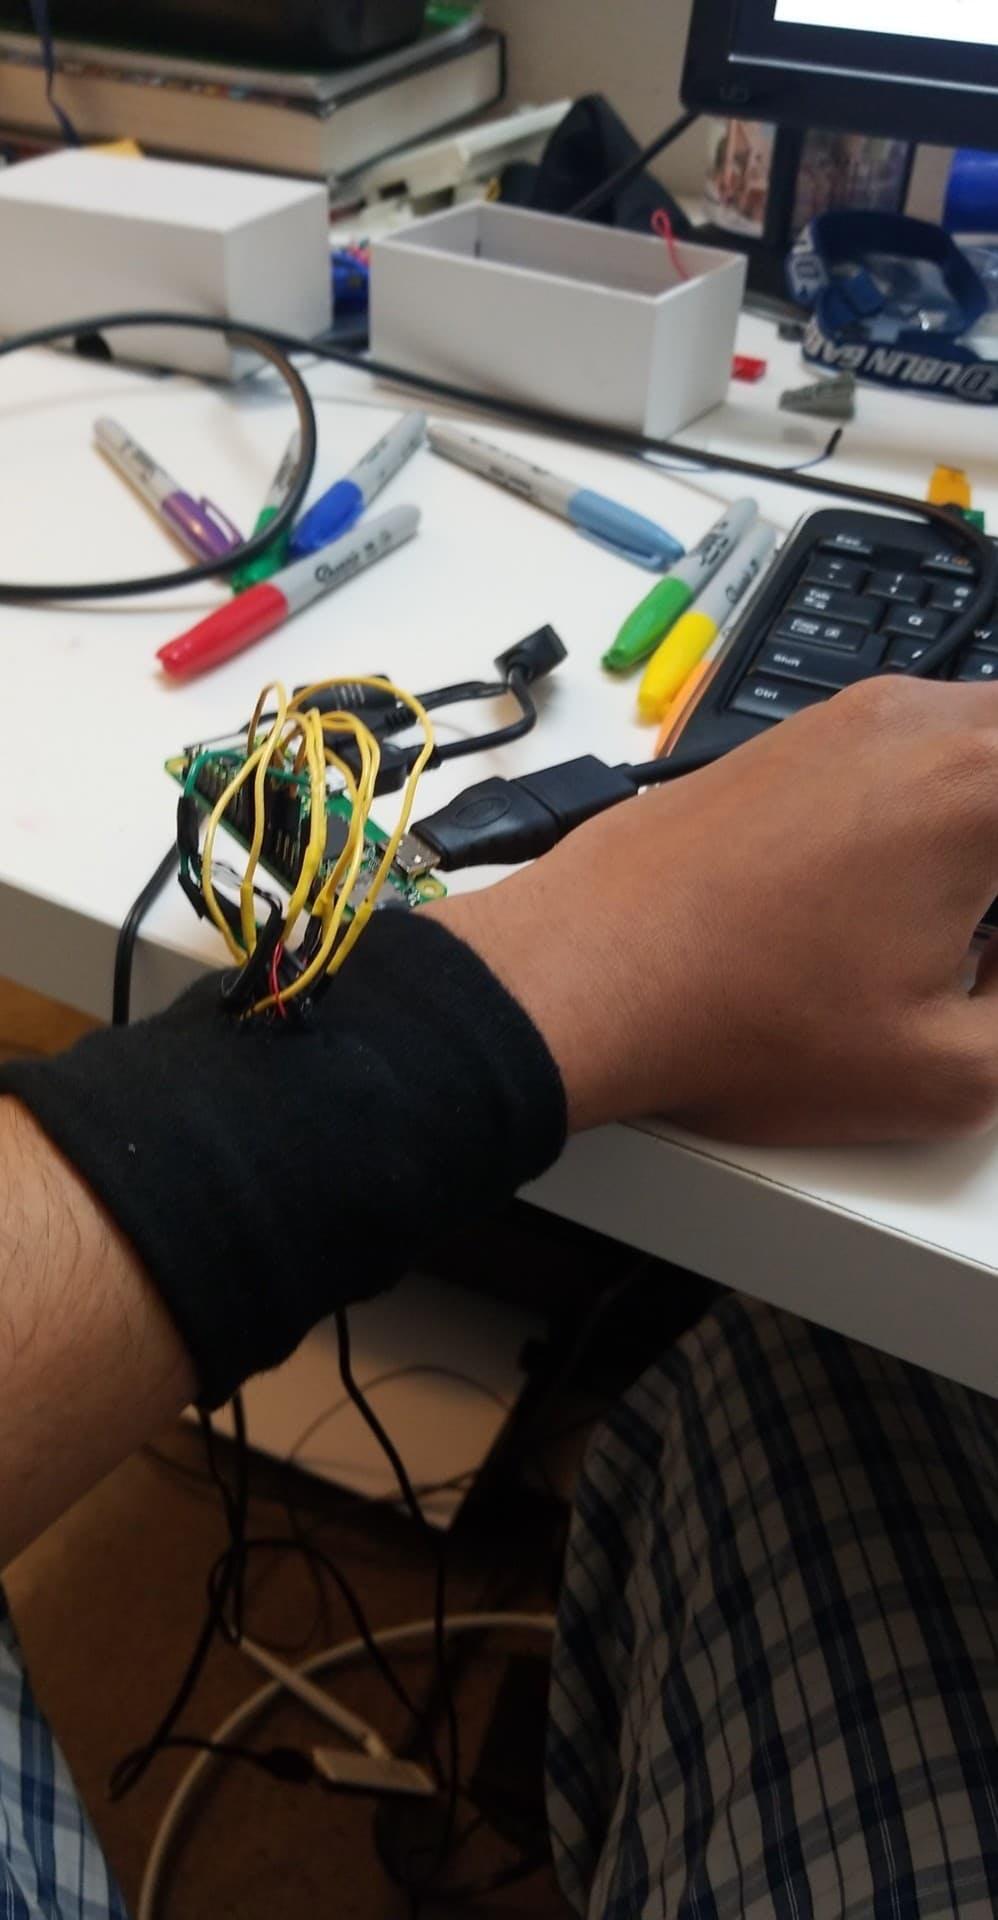 Using a sock as an armband